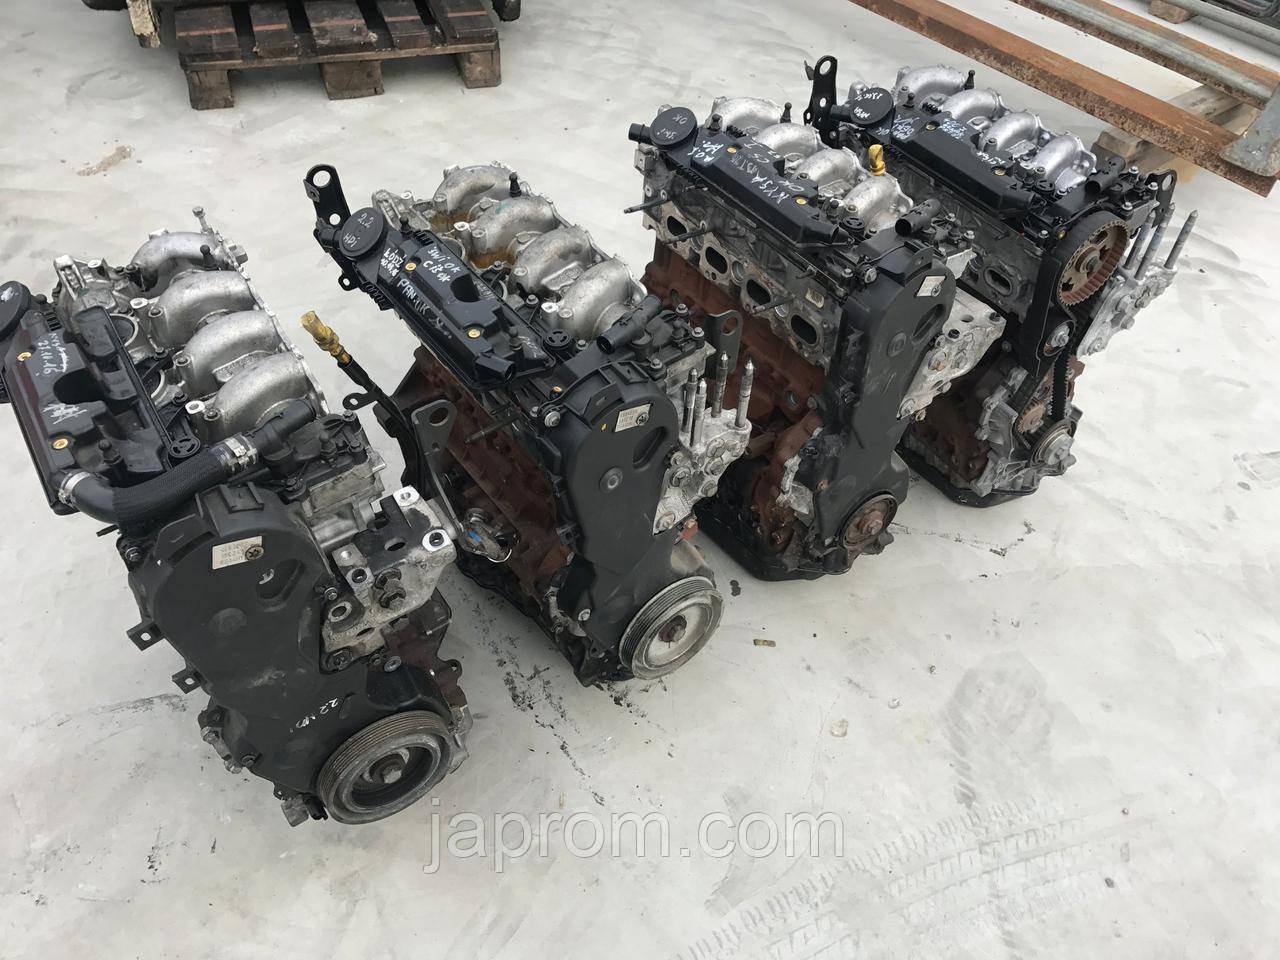 Мотор (Двигатель) Citroen C5 C6 C8 , Peugeot 407 607 2005-2012г.в. 2.2 HDI Bi-turbo